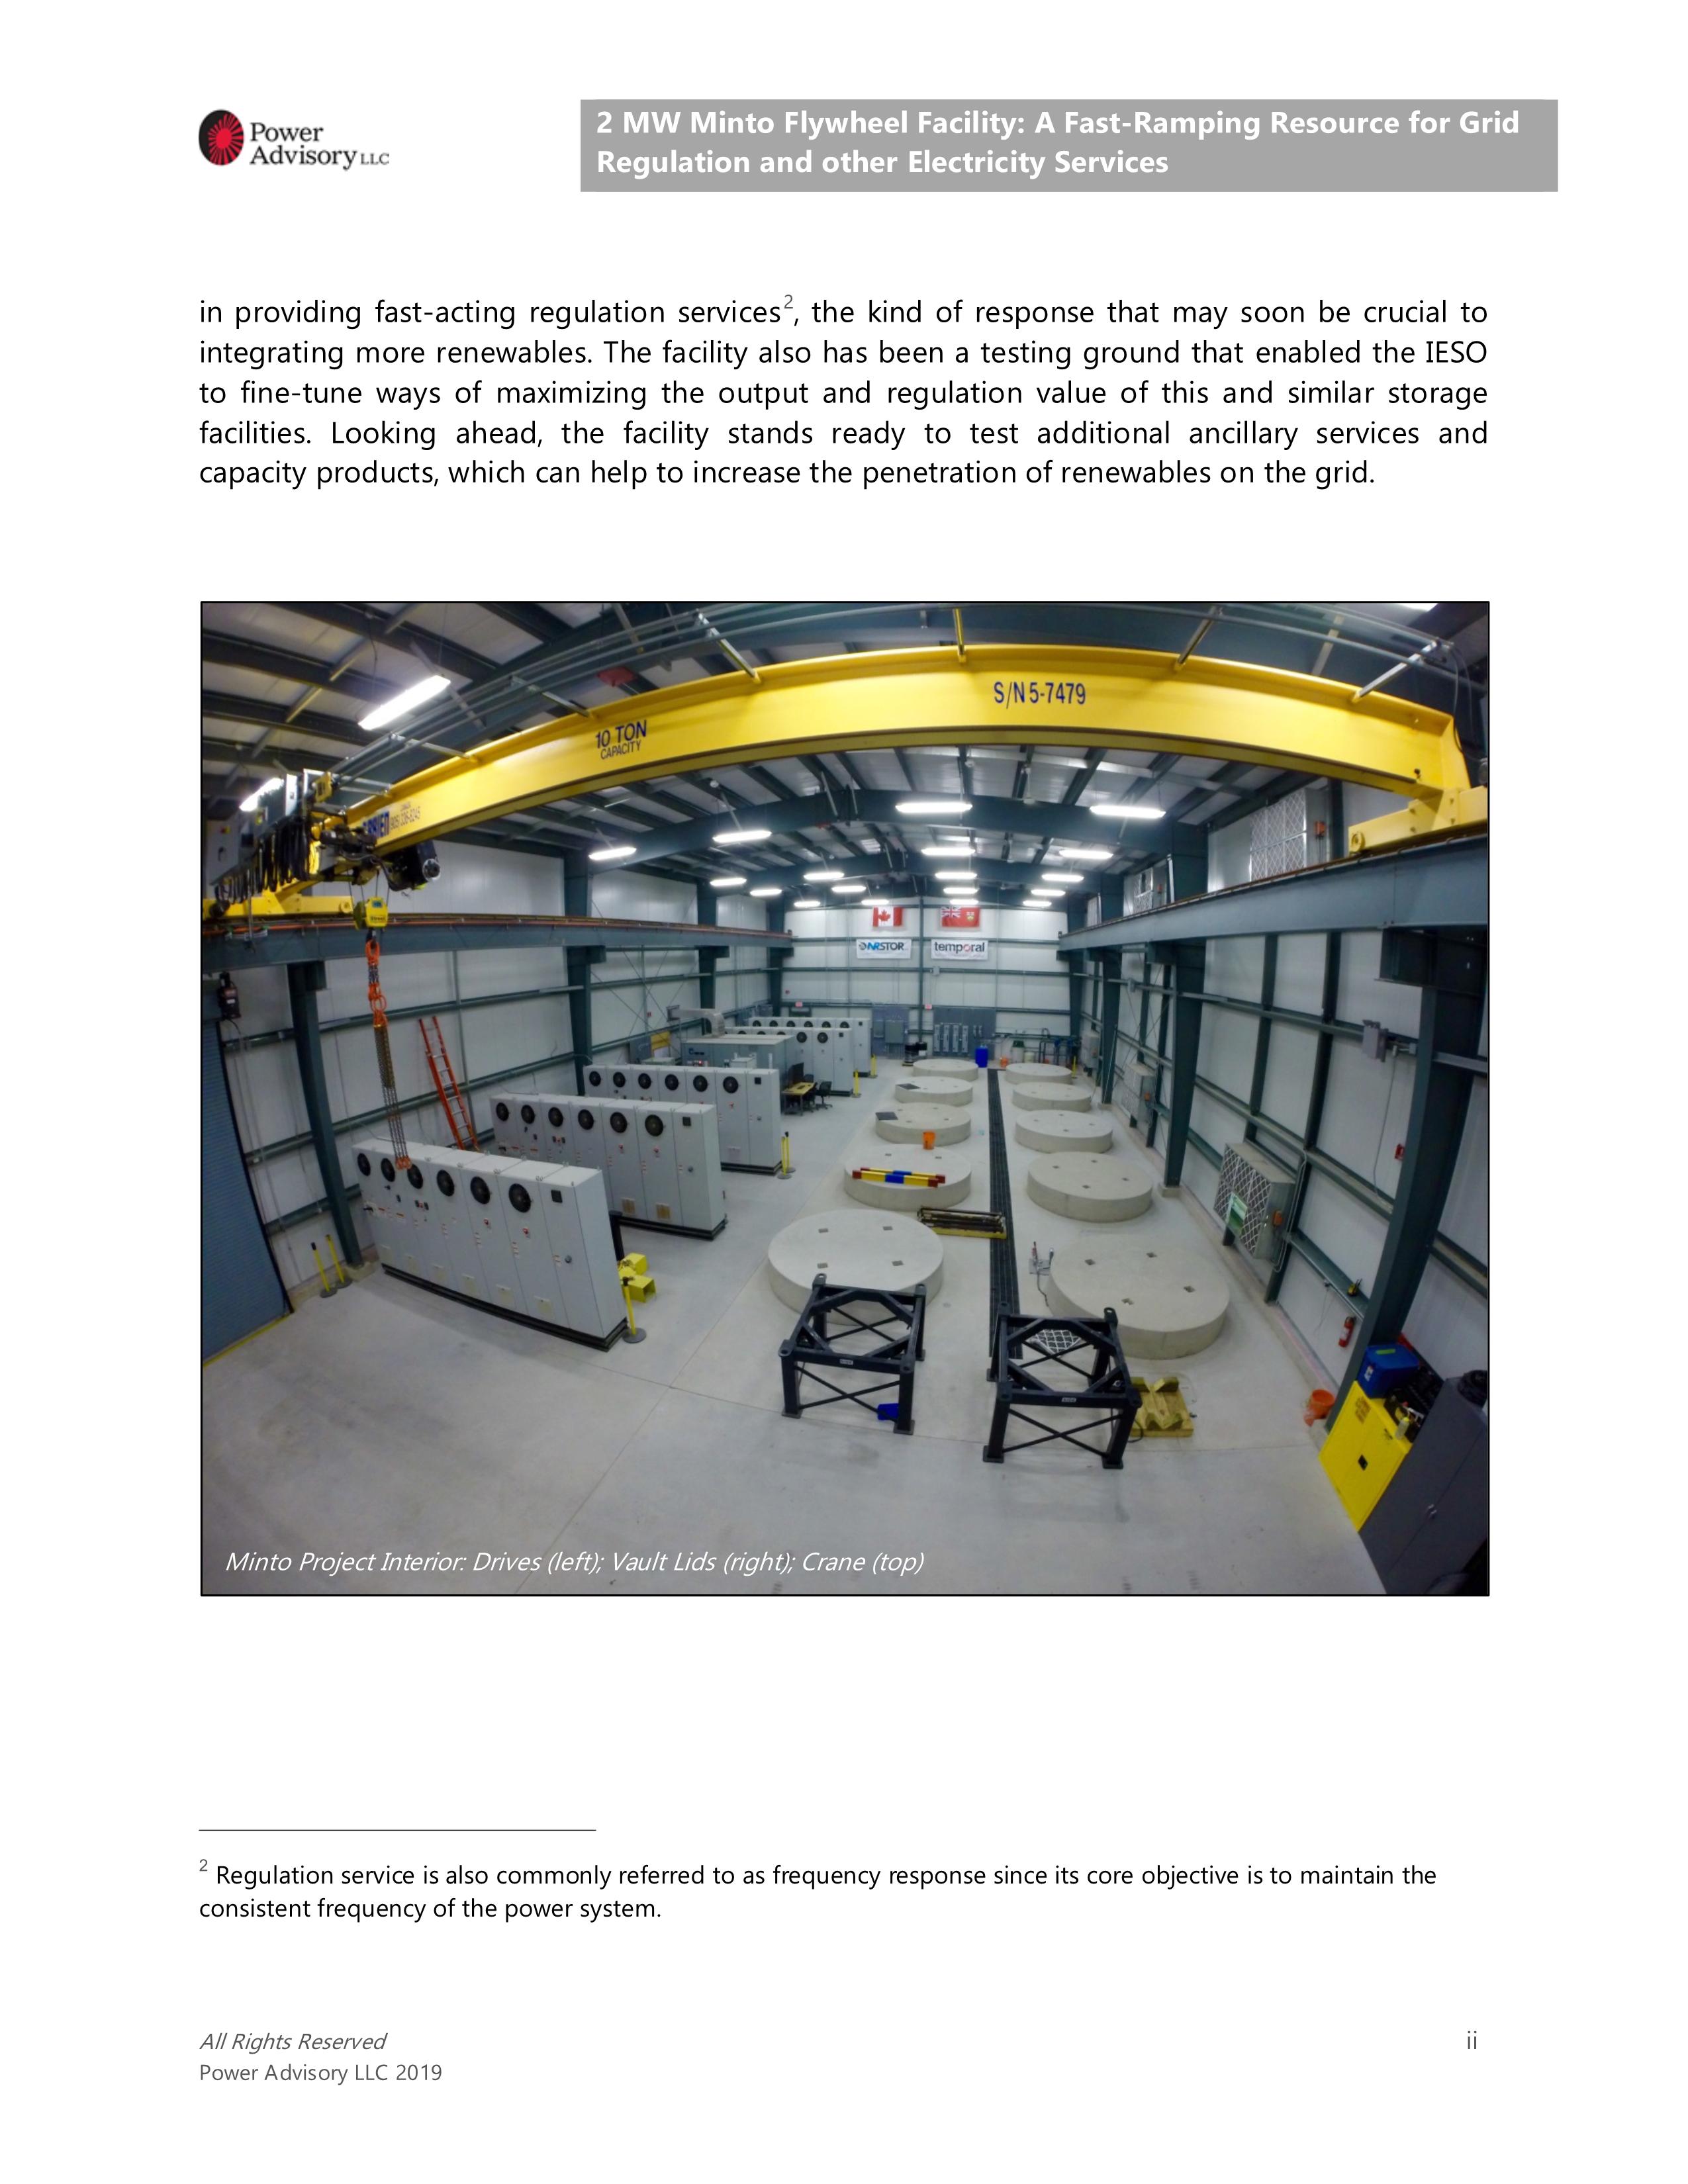 2-MW-Minto-Flywheel-Facility-Case-Study_3.jpg